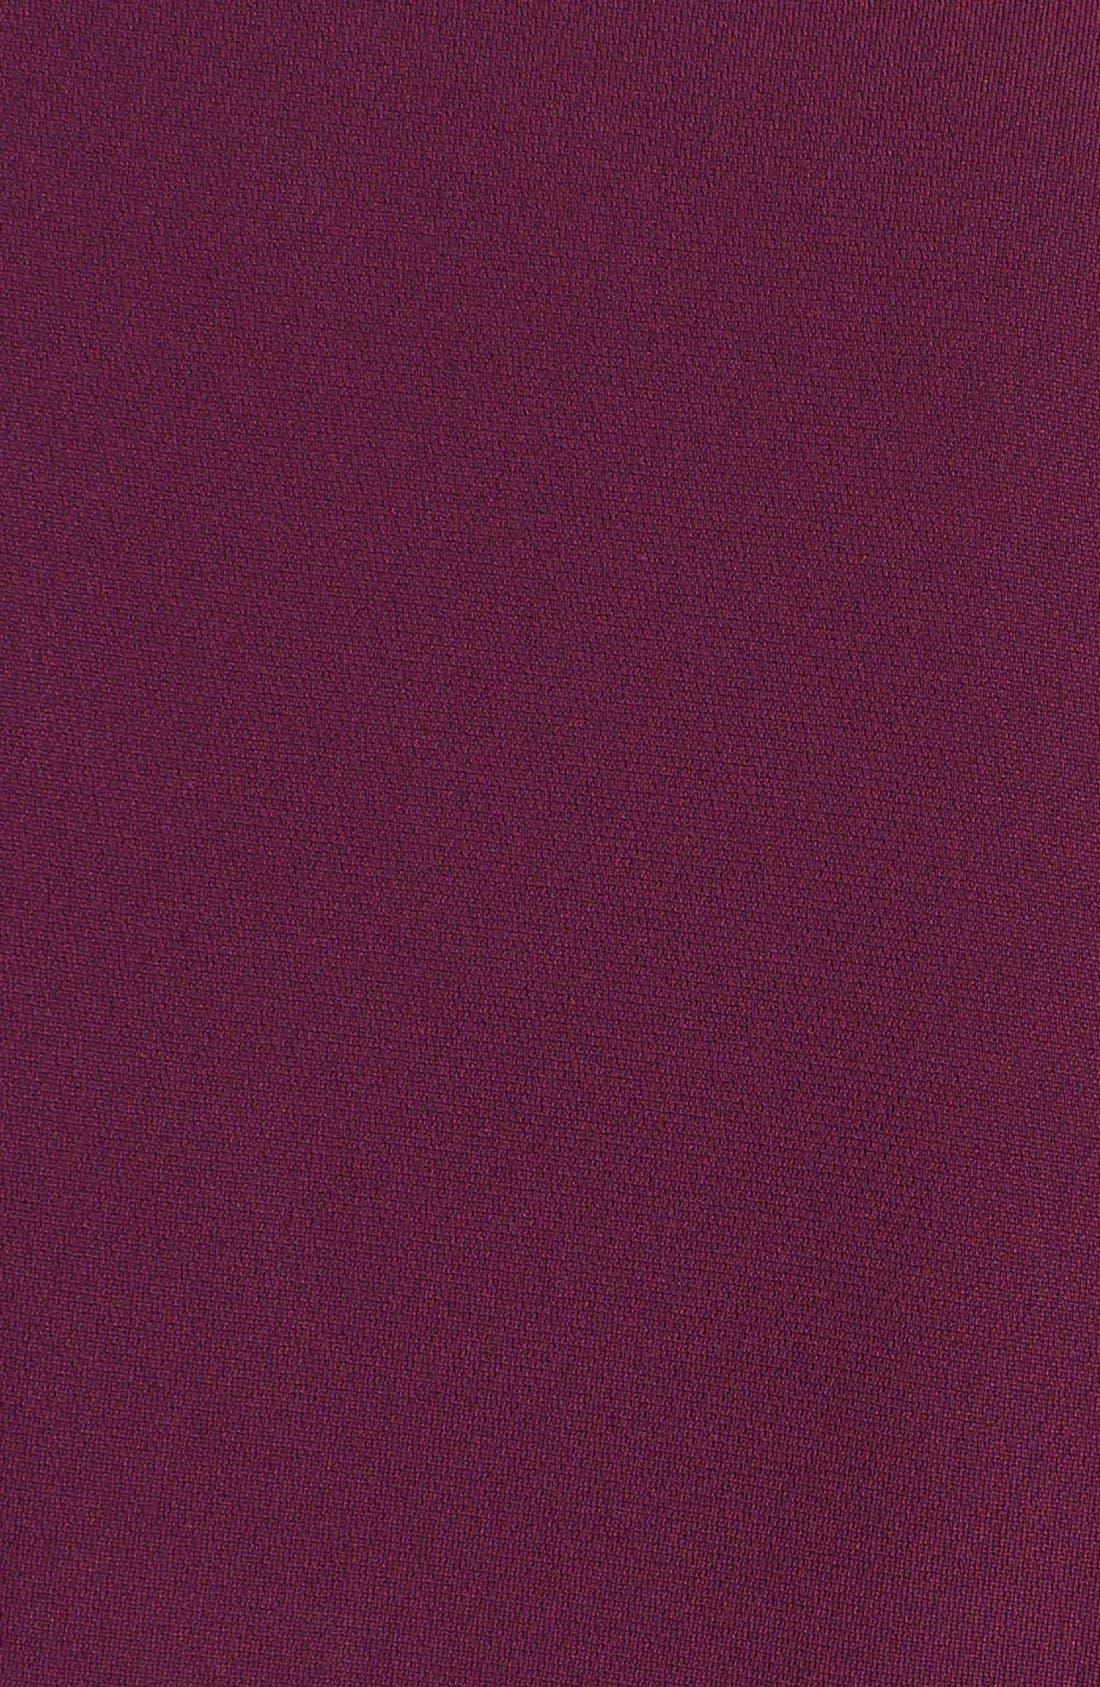 Alternate Image 3  - BOSS HUGO BOSS 'Daperlina' Sheath Dress